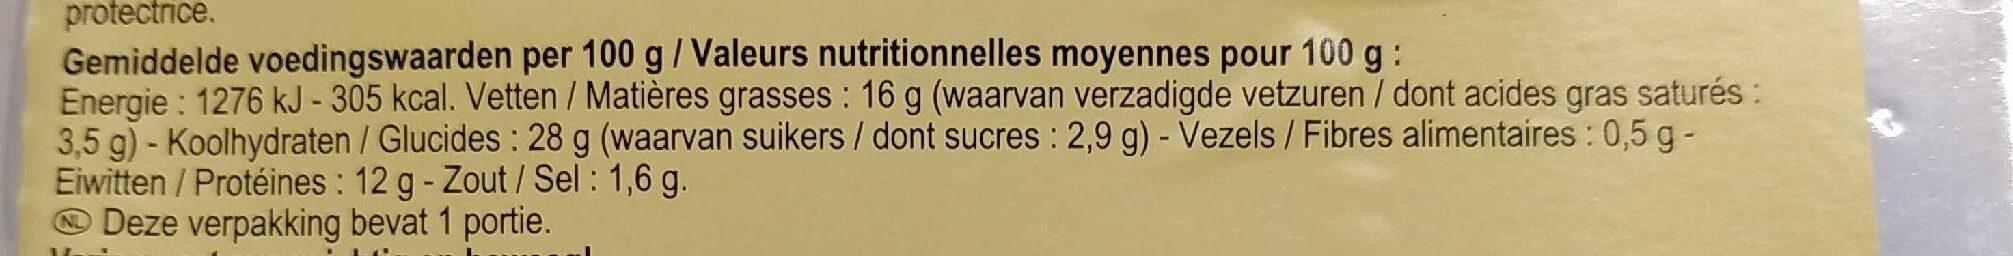 Max Chicken burger - Informations nutritionnelles - fr